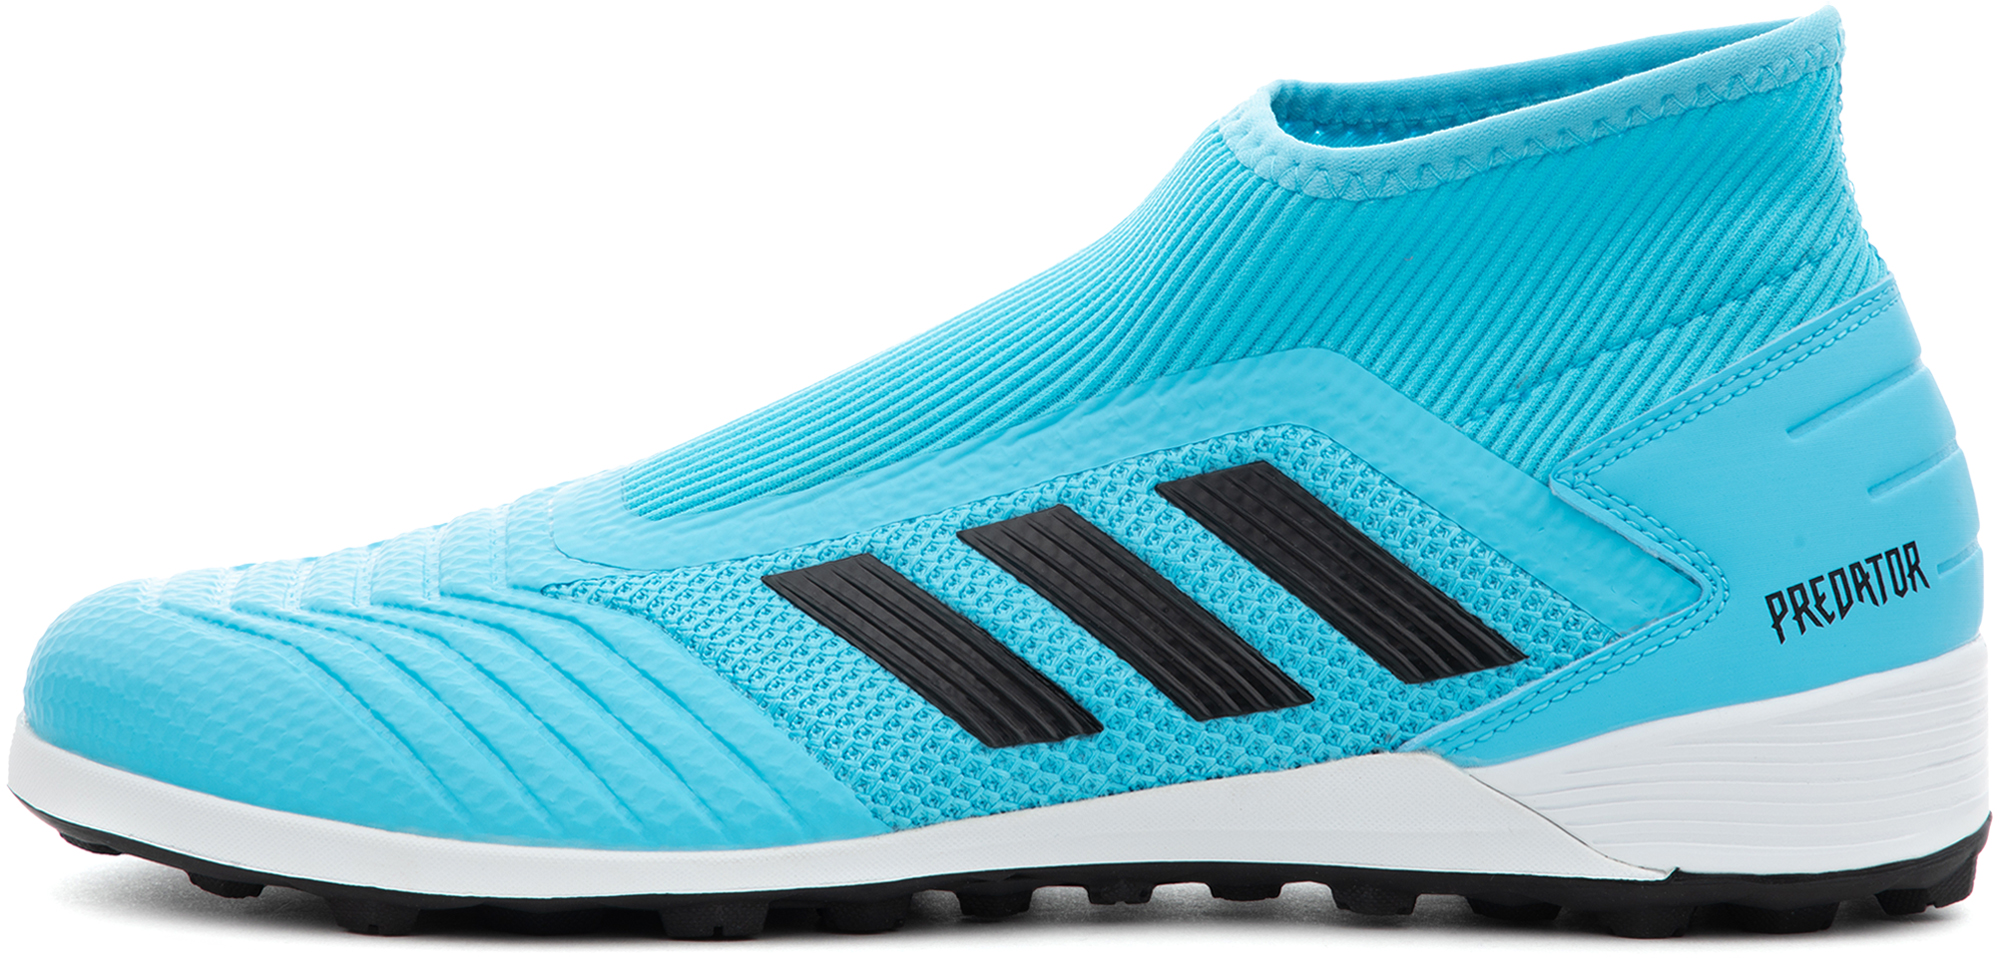 Adidas Бутсы мужские Predator 19.3 TF, размер 45